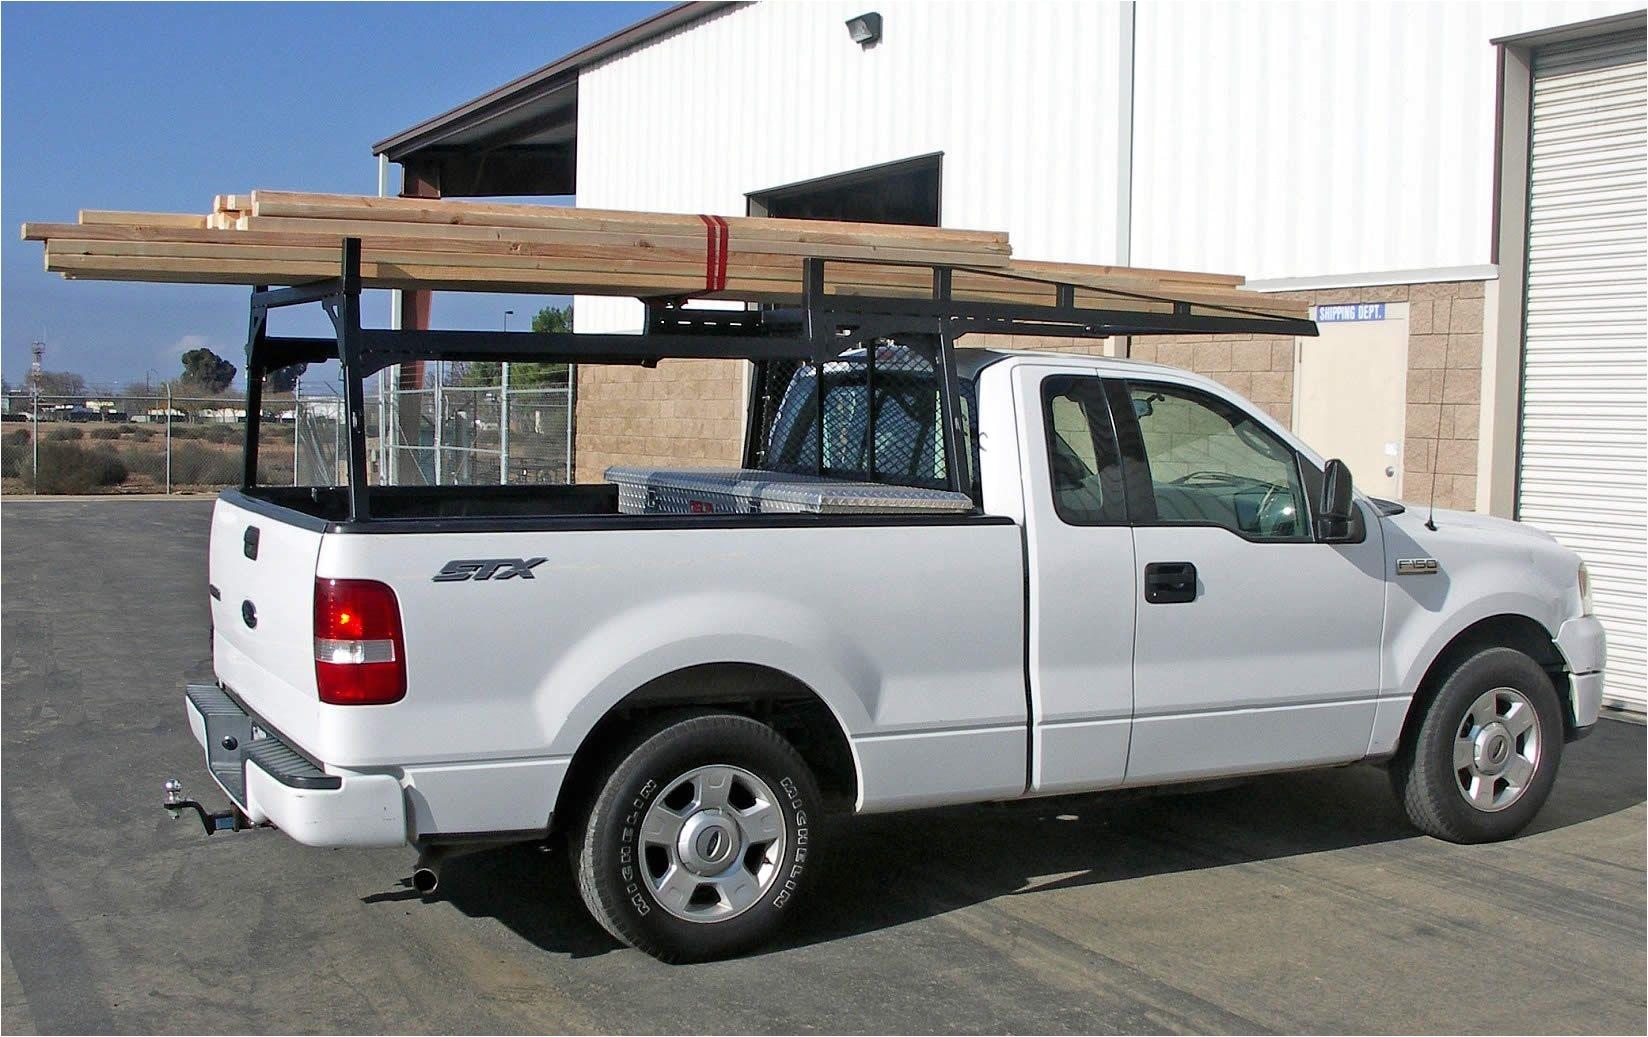 heavy duty truck racks www heavydutytruckracks com image of job site